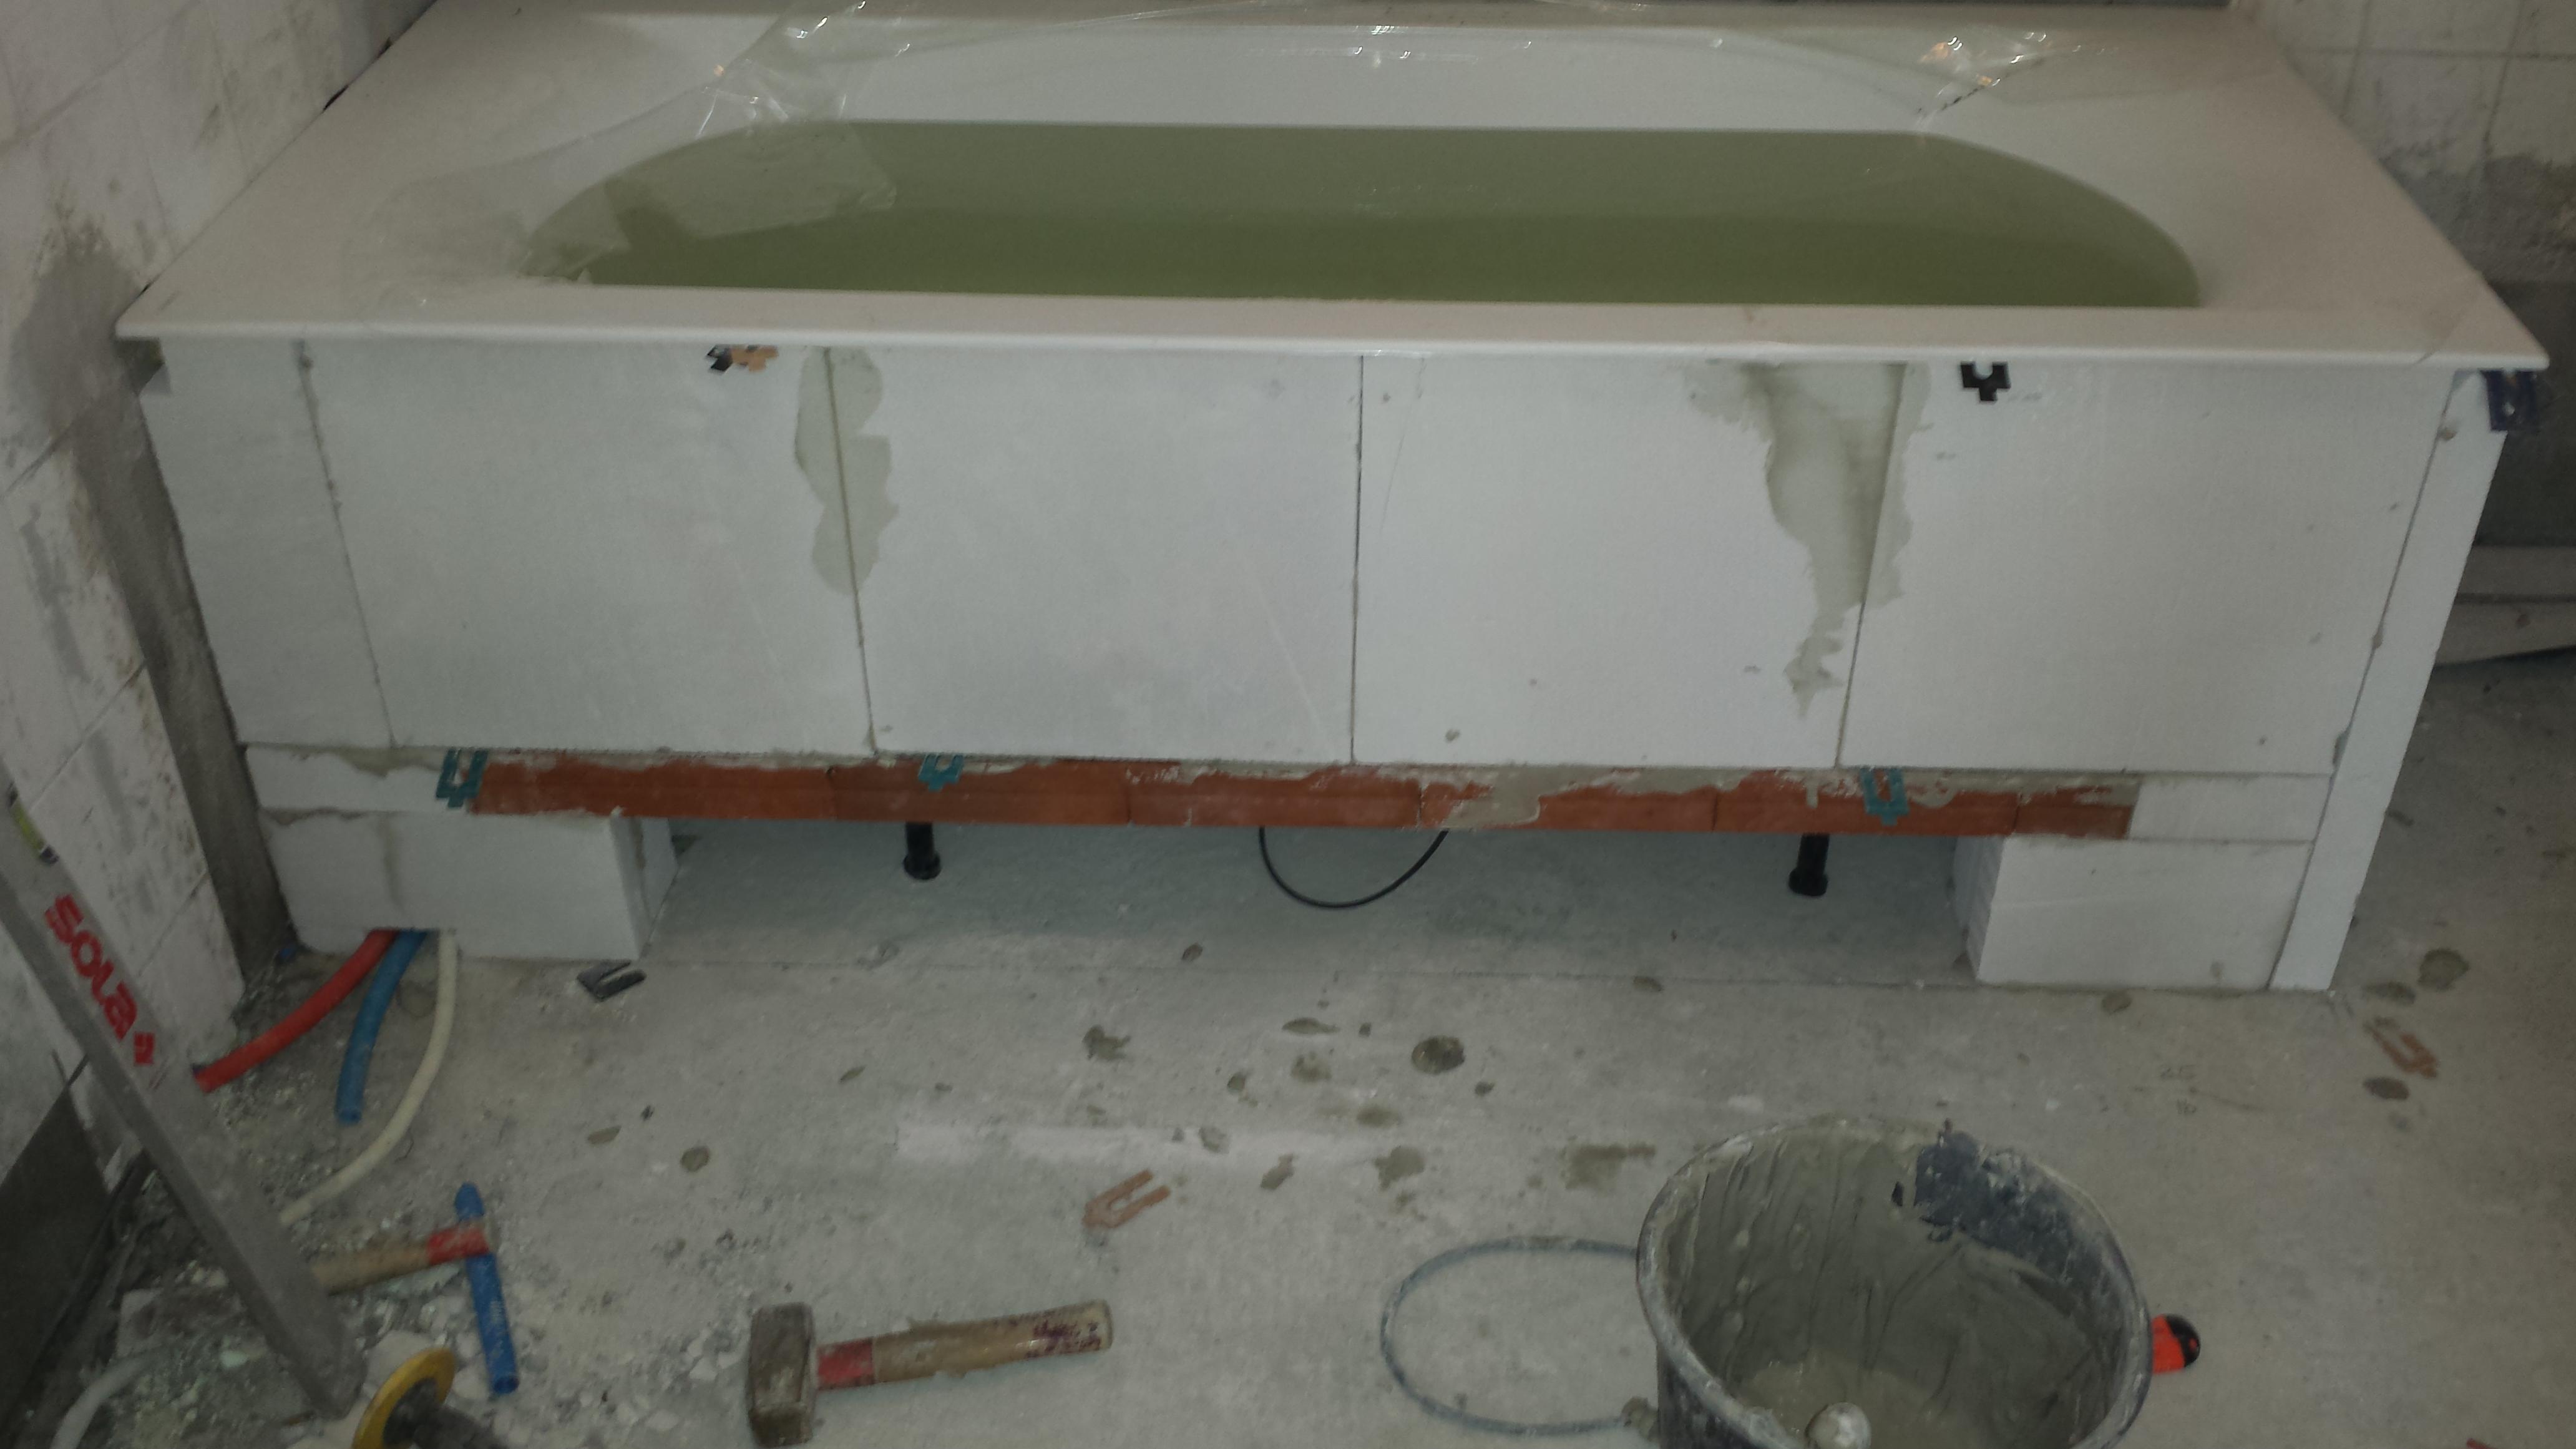 Badkamer opbouwen en tegelen Zaltbommel | Badkamer Installatie ...